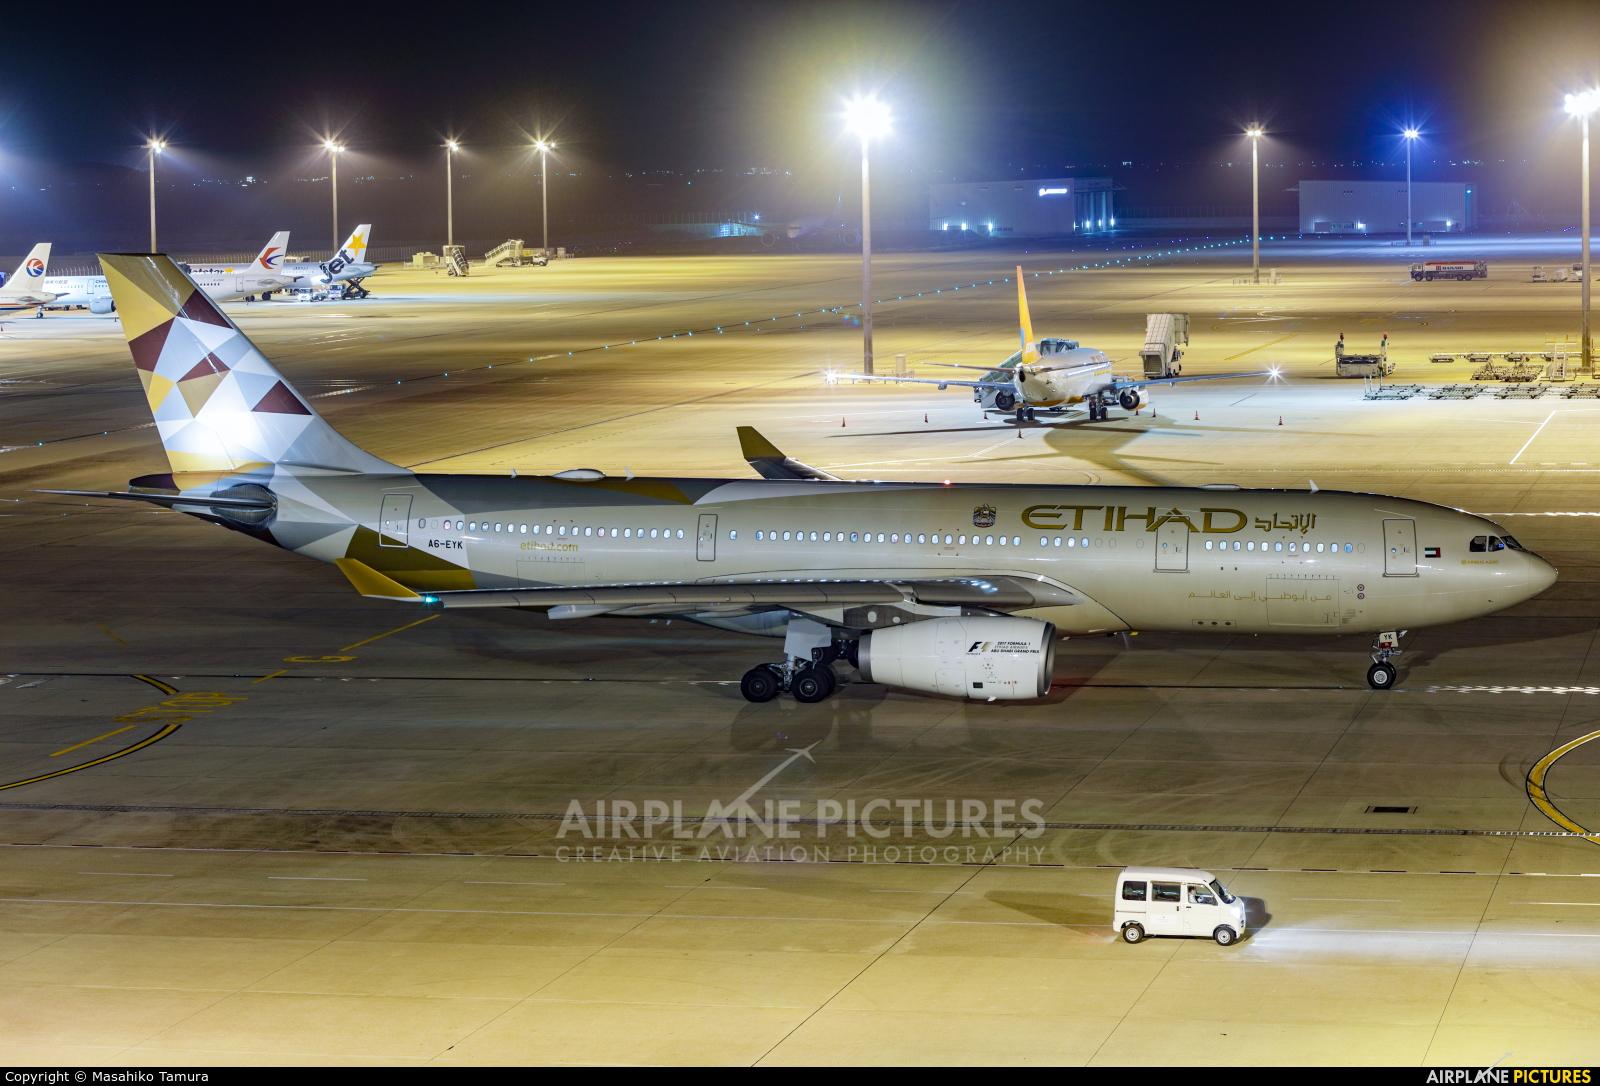 Etihad Airways A6-EYK aircraft at Chubu Centrair Intl